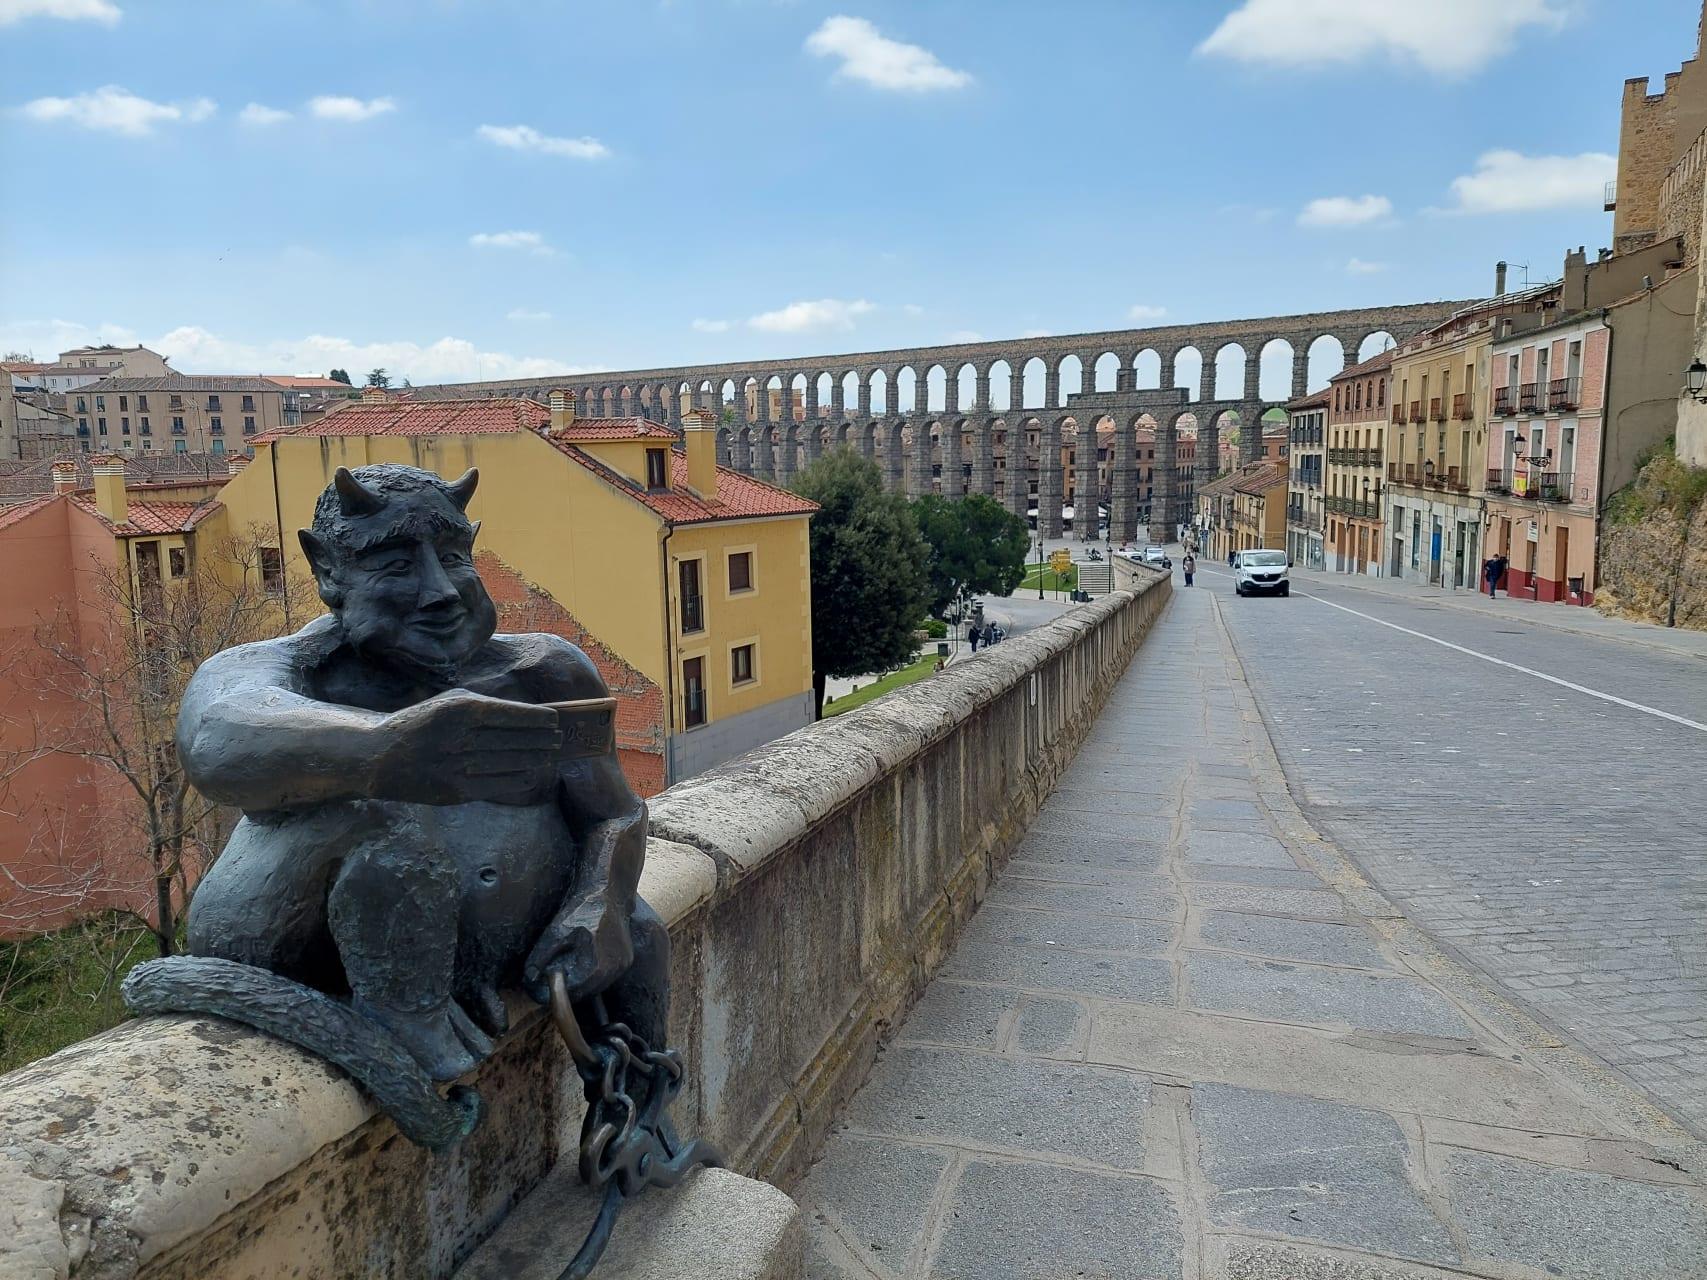 Segovia - More than 3 Truths, 2 Lies, 1 Legend